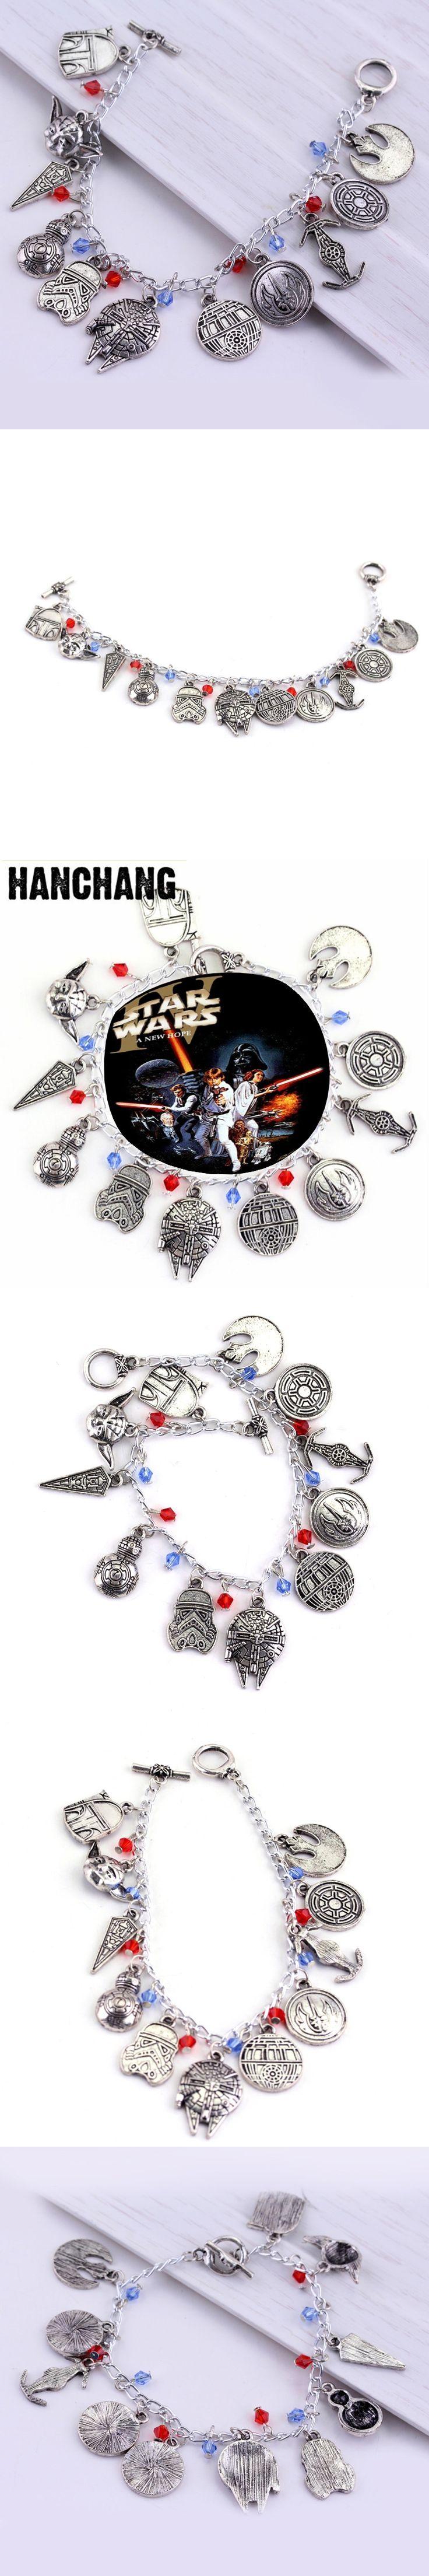 Movie Star Wars Series Charm Bracelets Jewelry BB8 Robot Darth Vader Stormtrooper Pendants Bracelet Female Cosplay A Bracelet